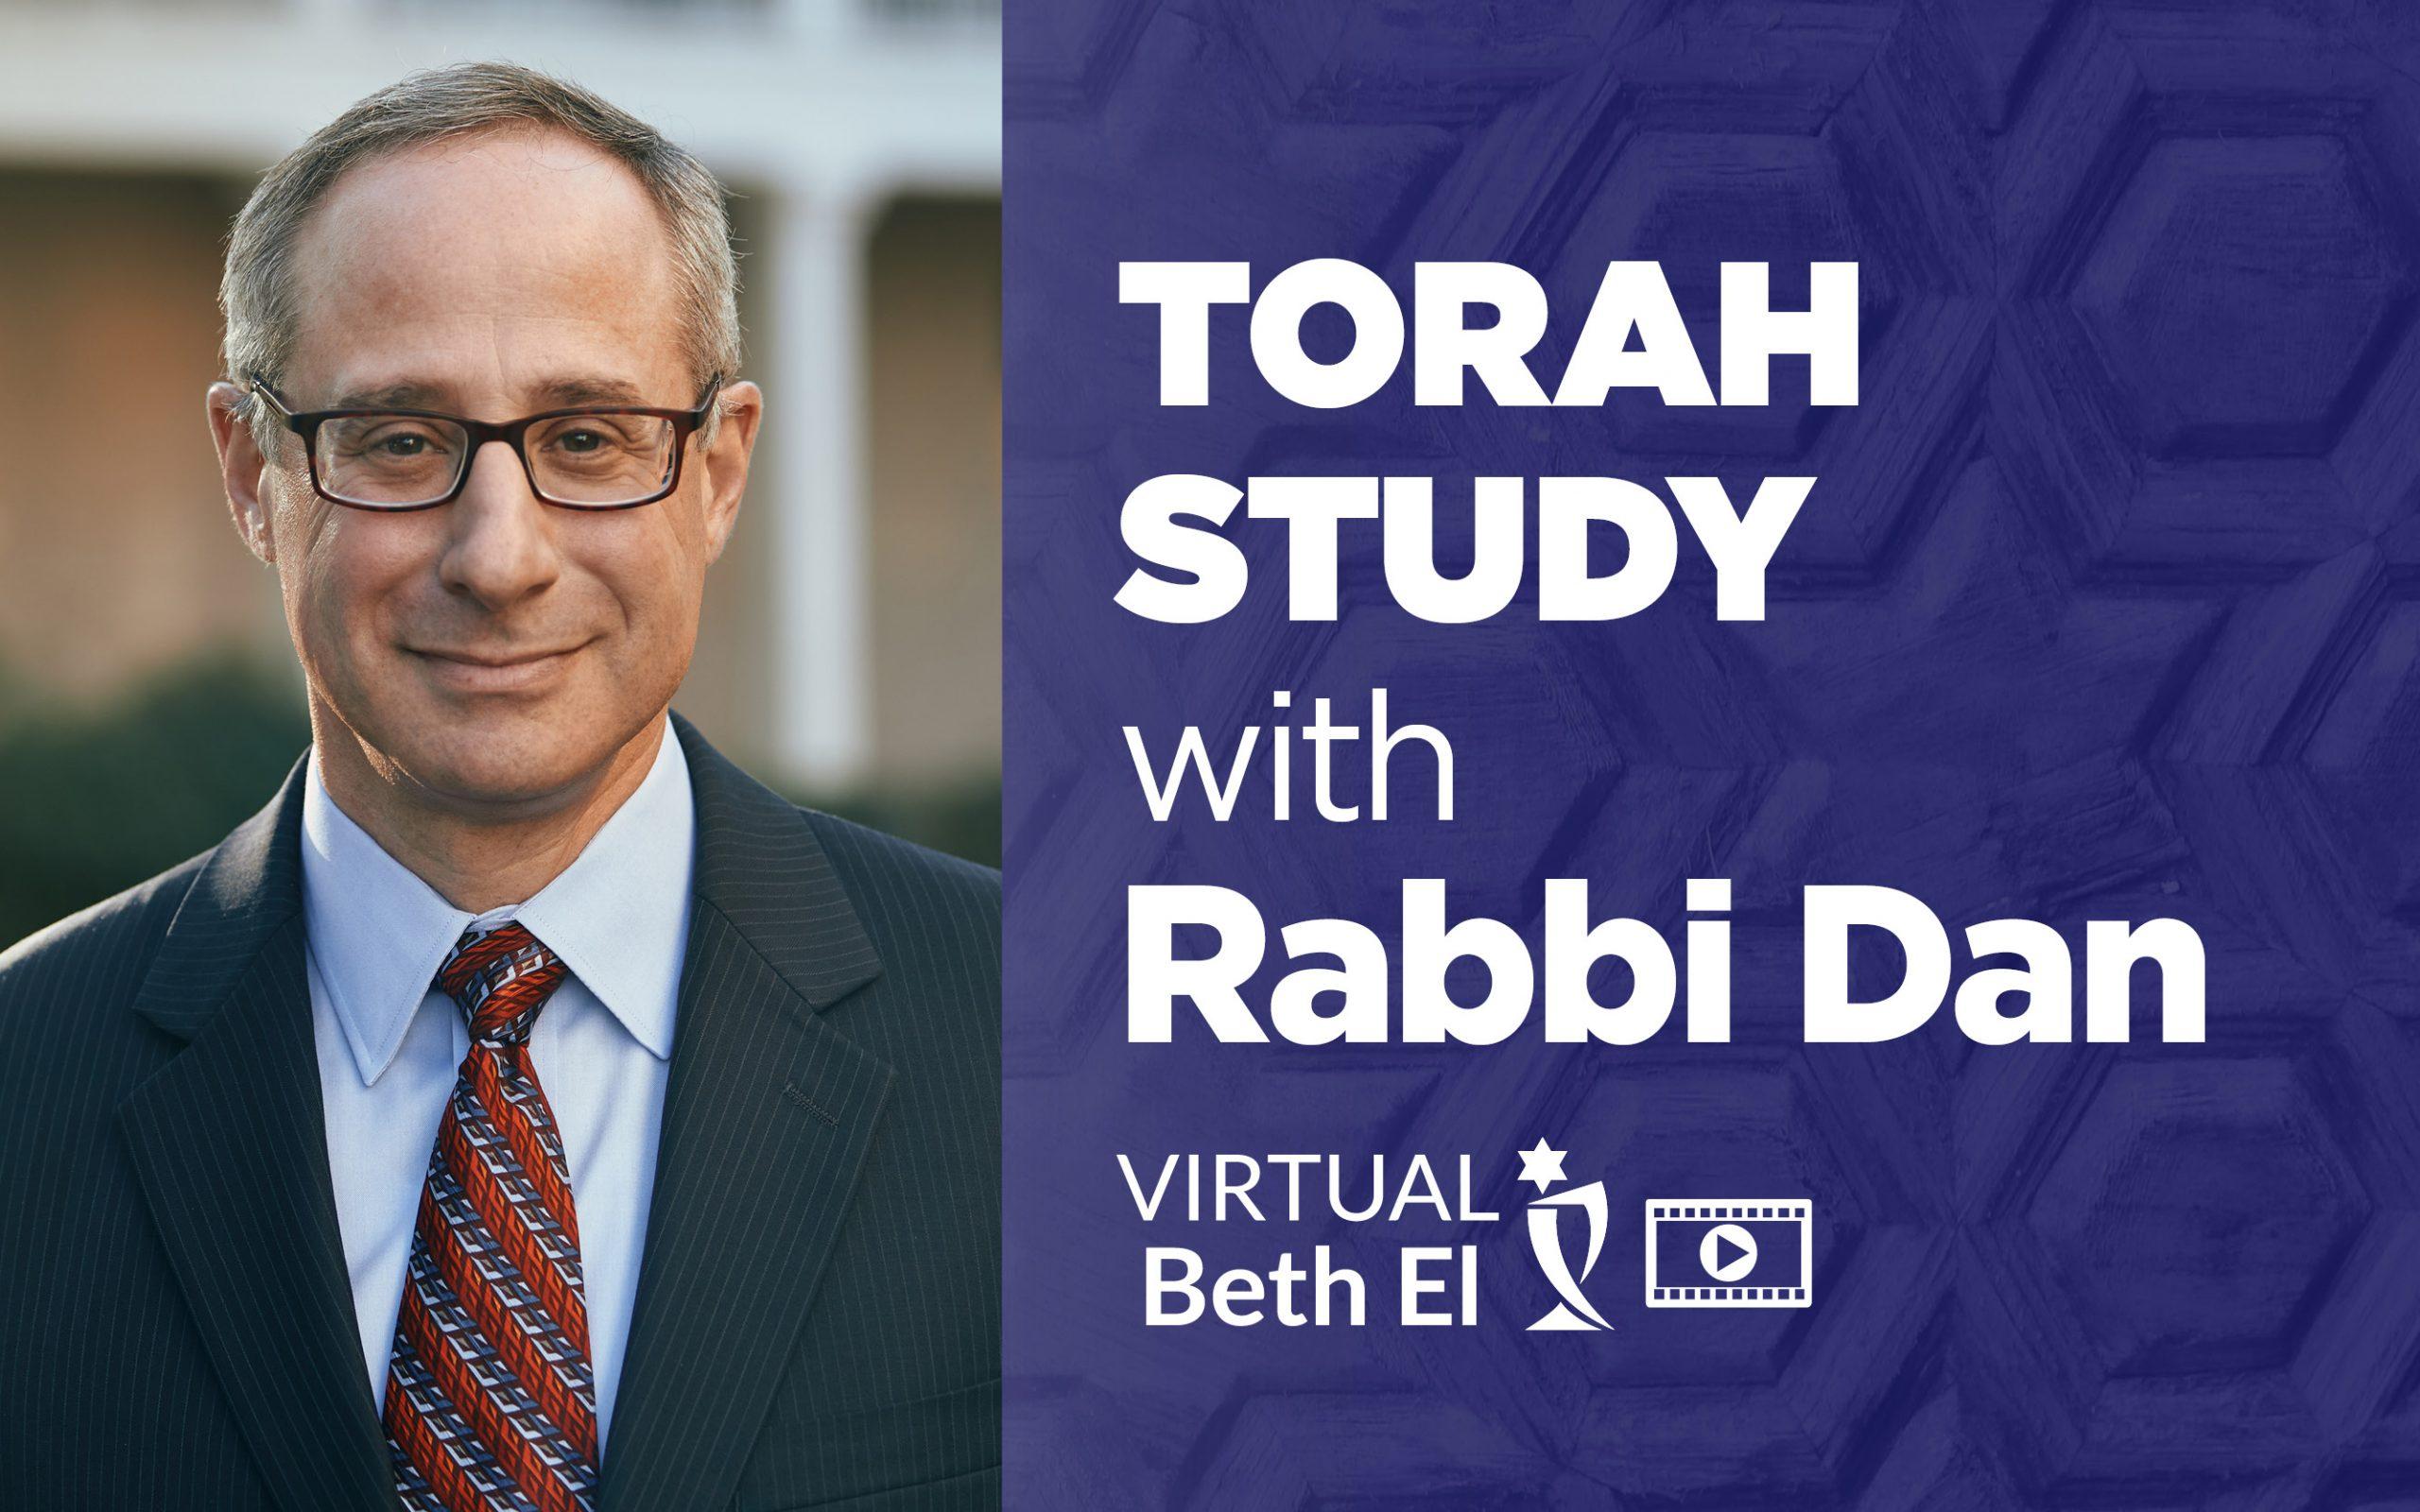 Torah Study with Rabbi Dan Levin with Temple Beth El event graphic for Temple Beth El